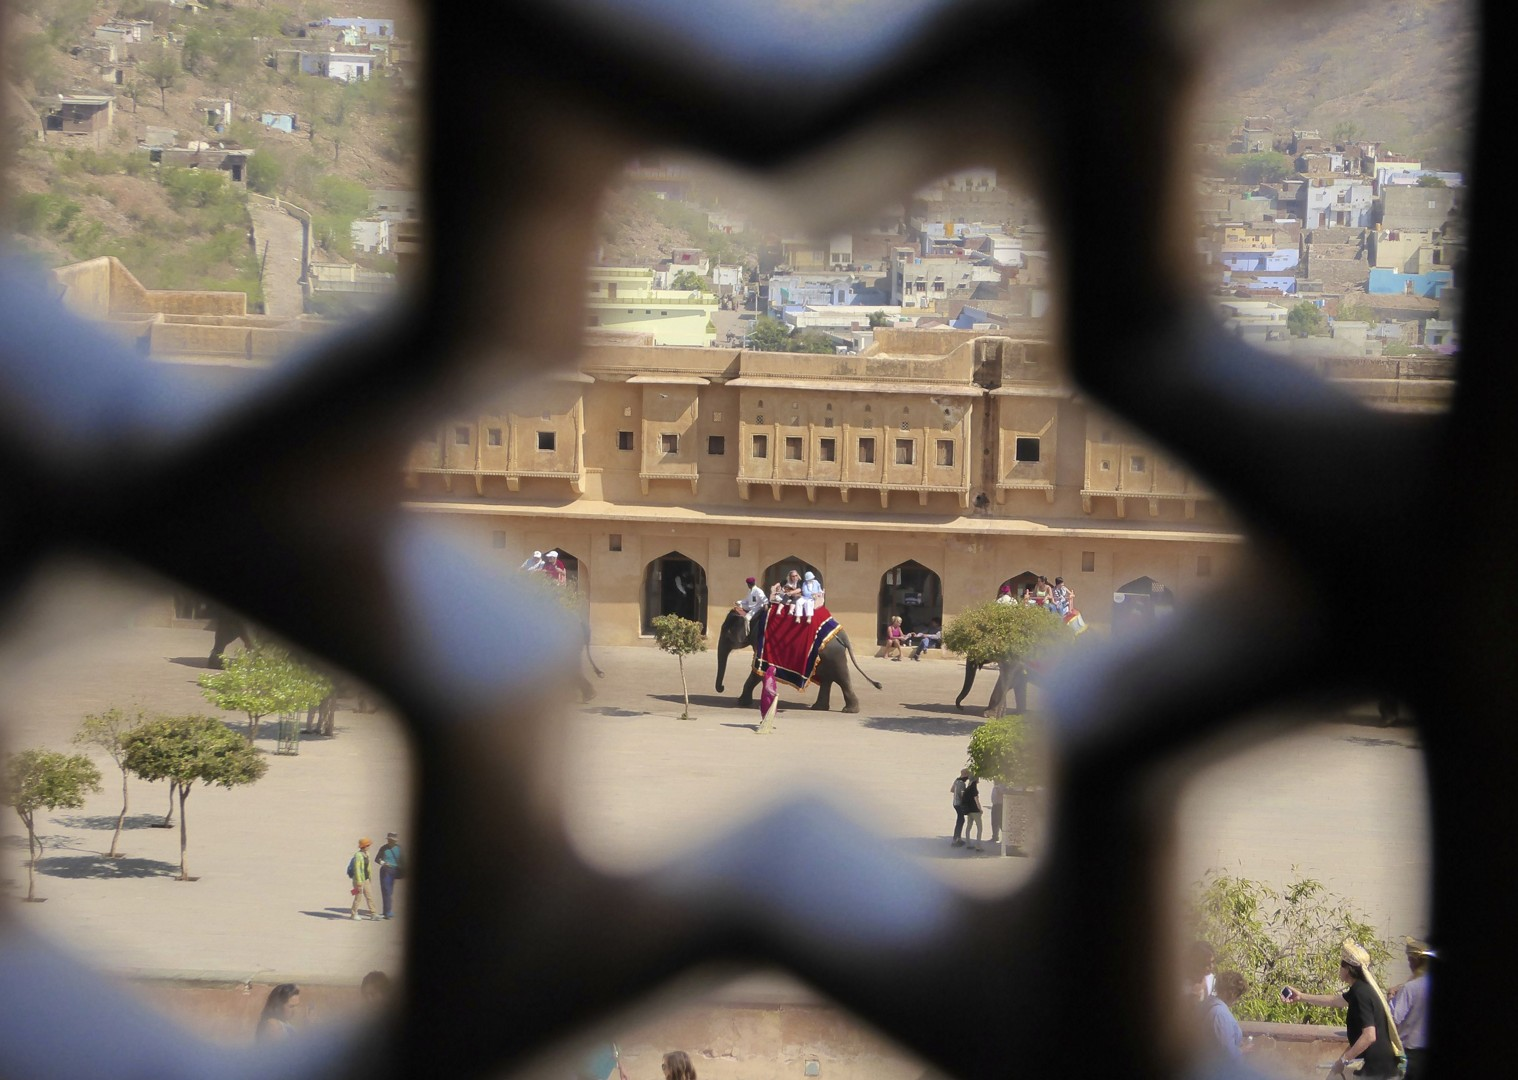 cycling-holiday-adventure-rajastan-palace.jpg - India - Palaces and Lakes of Rajasthan - Cycling Adventures